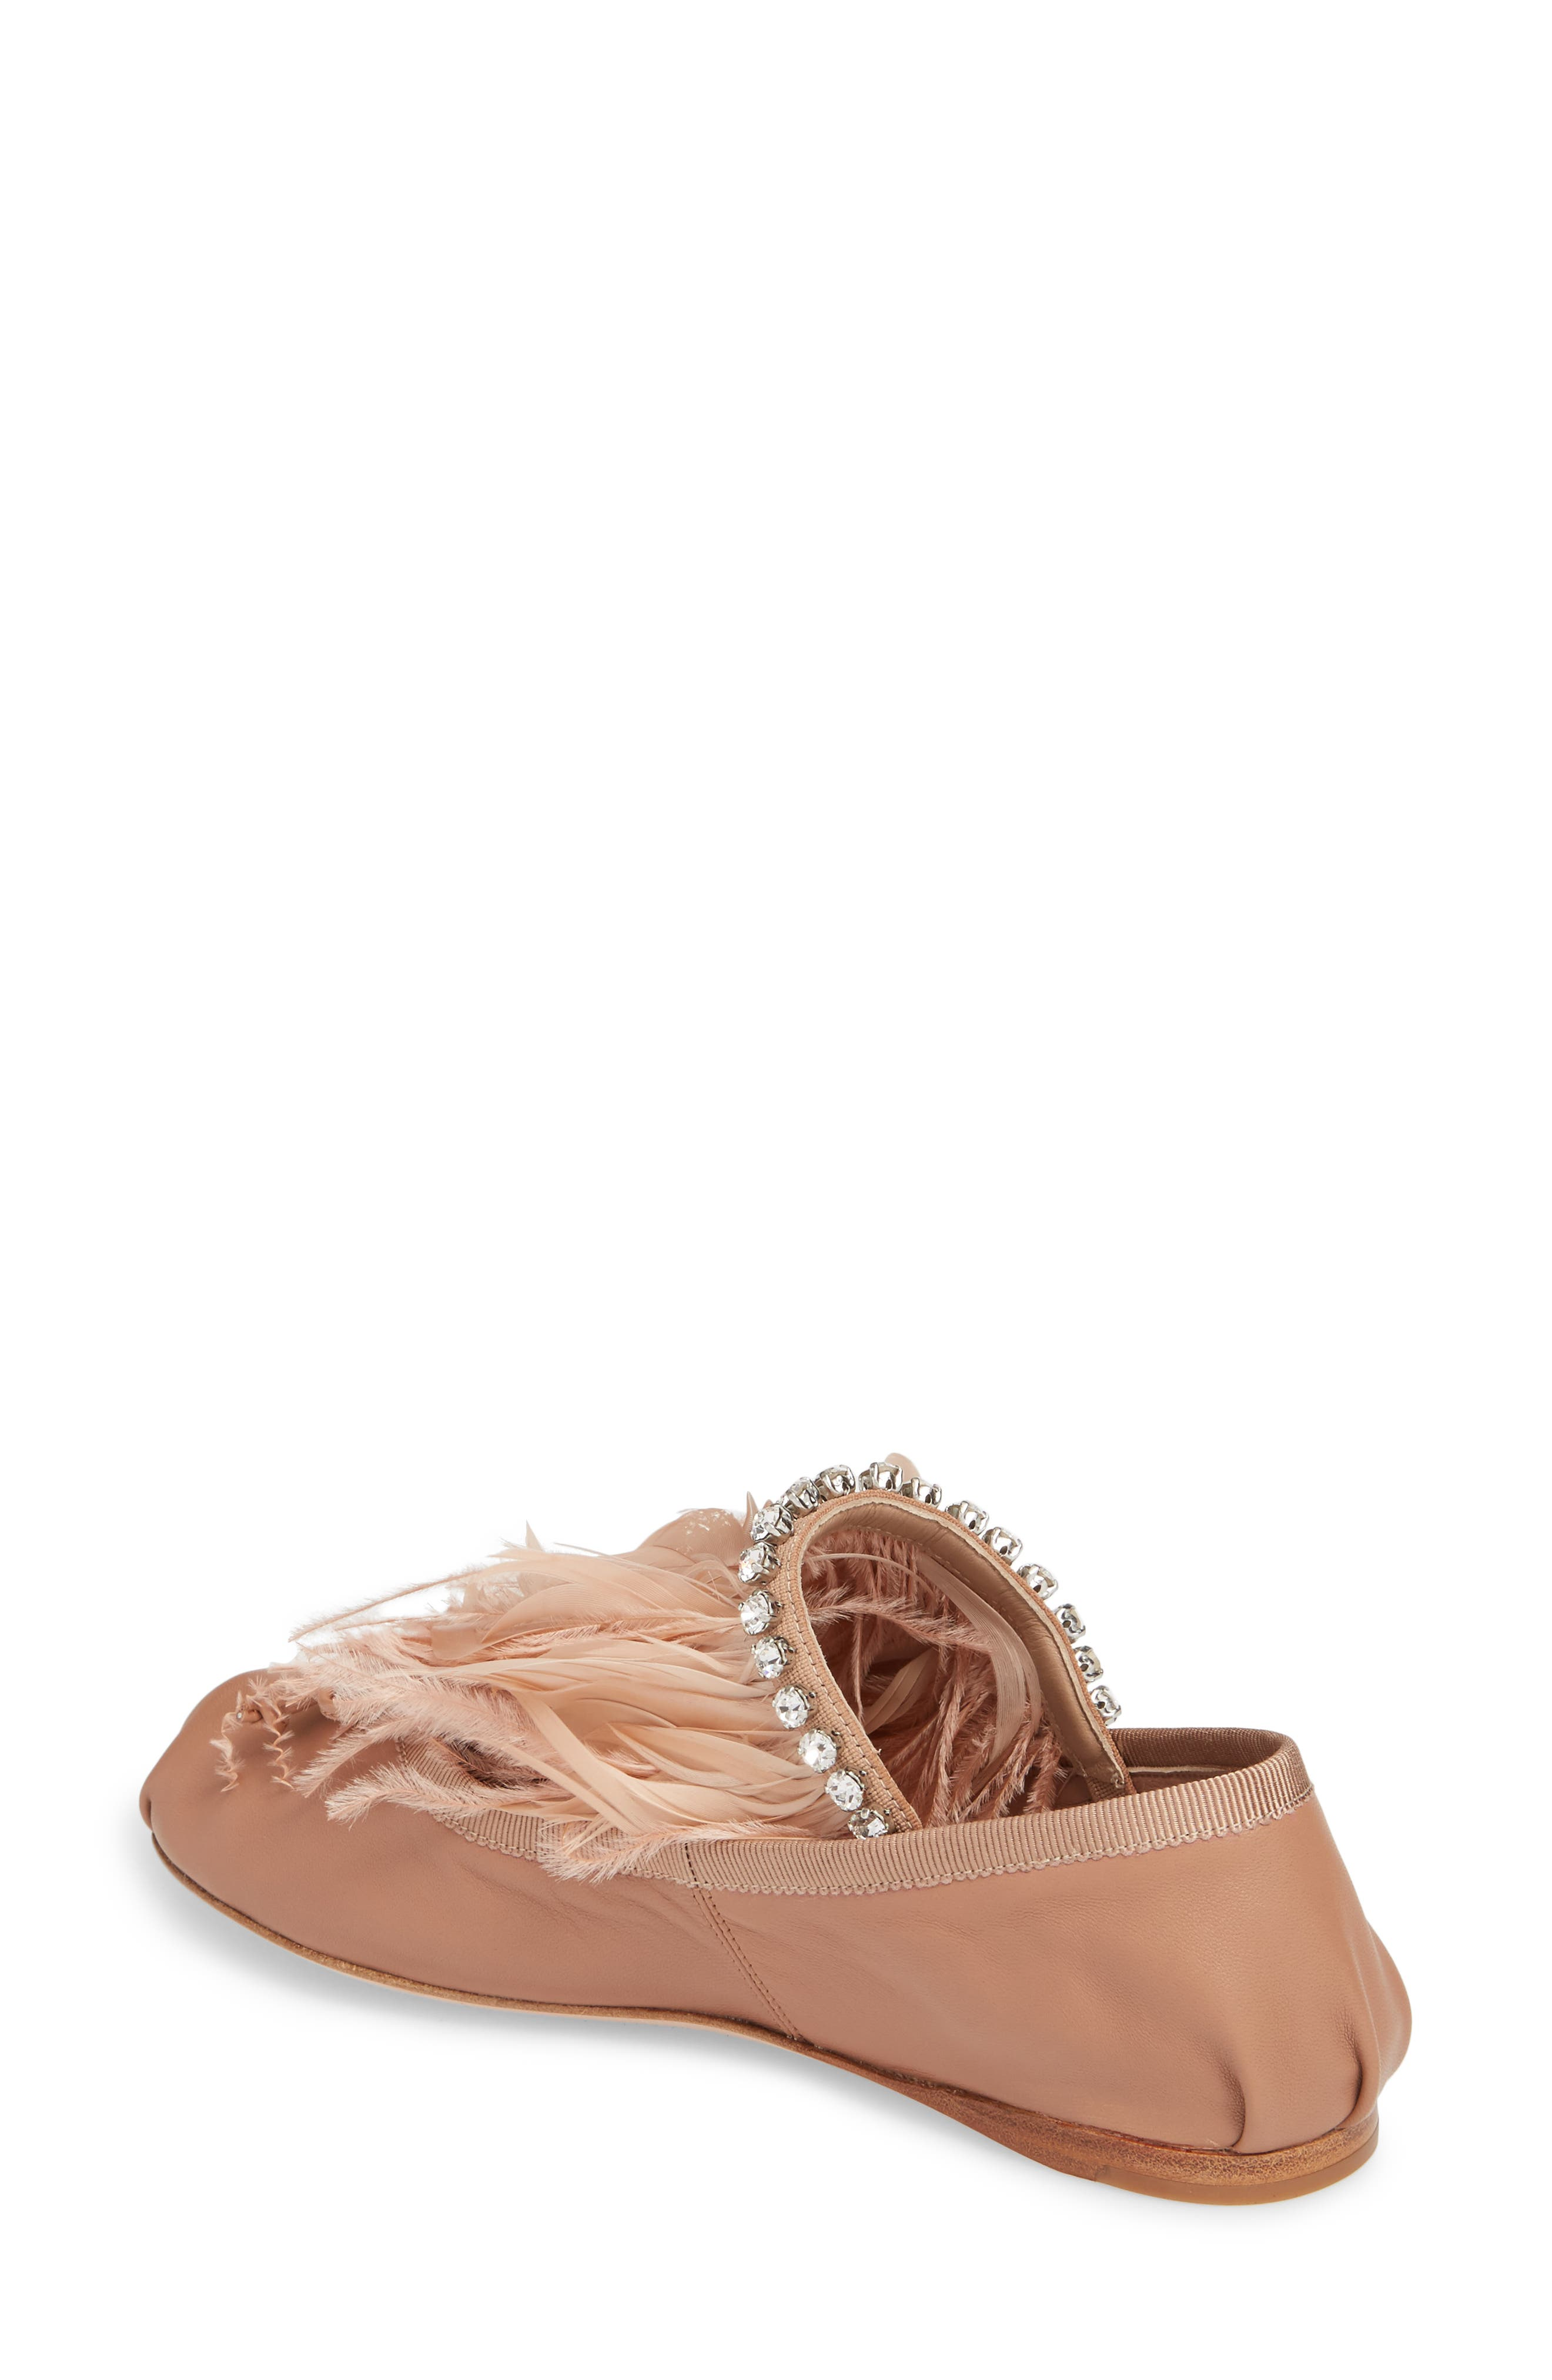 Feather Embellished Ballet Flat,                             Alternate thumbnail 2, color,                             Pink